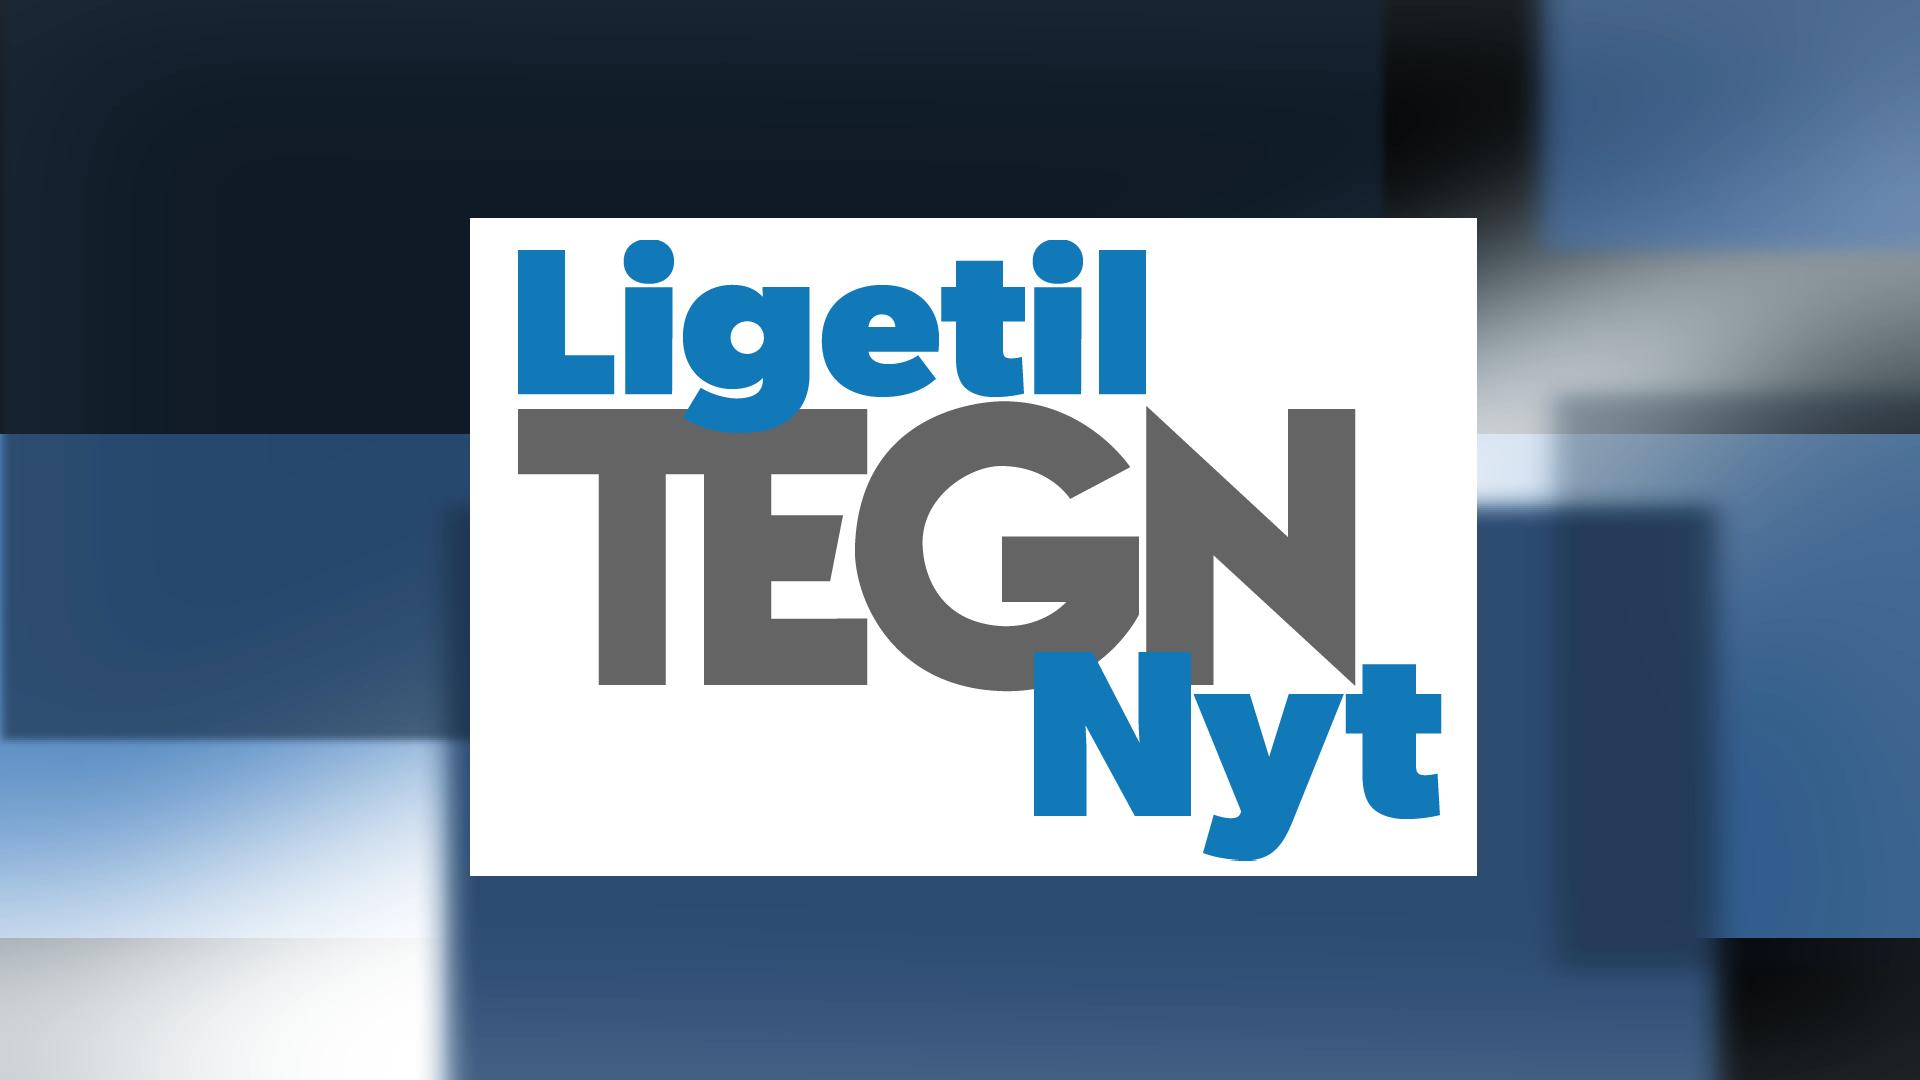 Ligetil Tegn Nyt logo